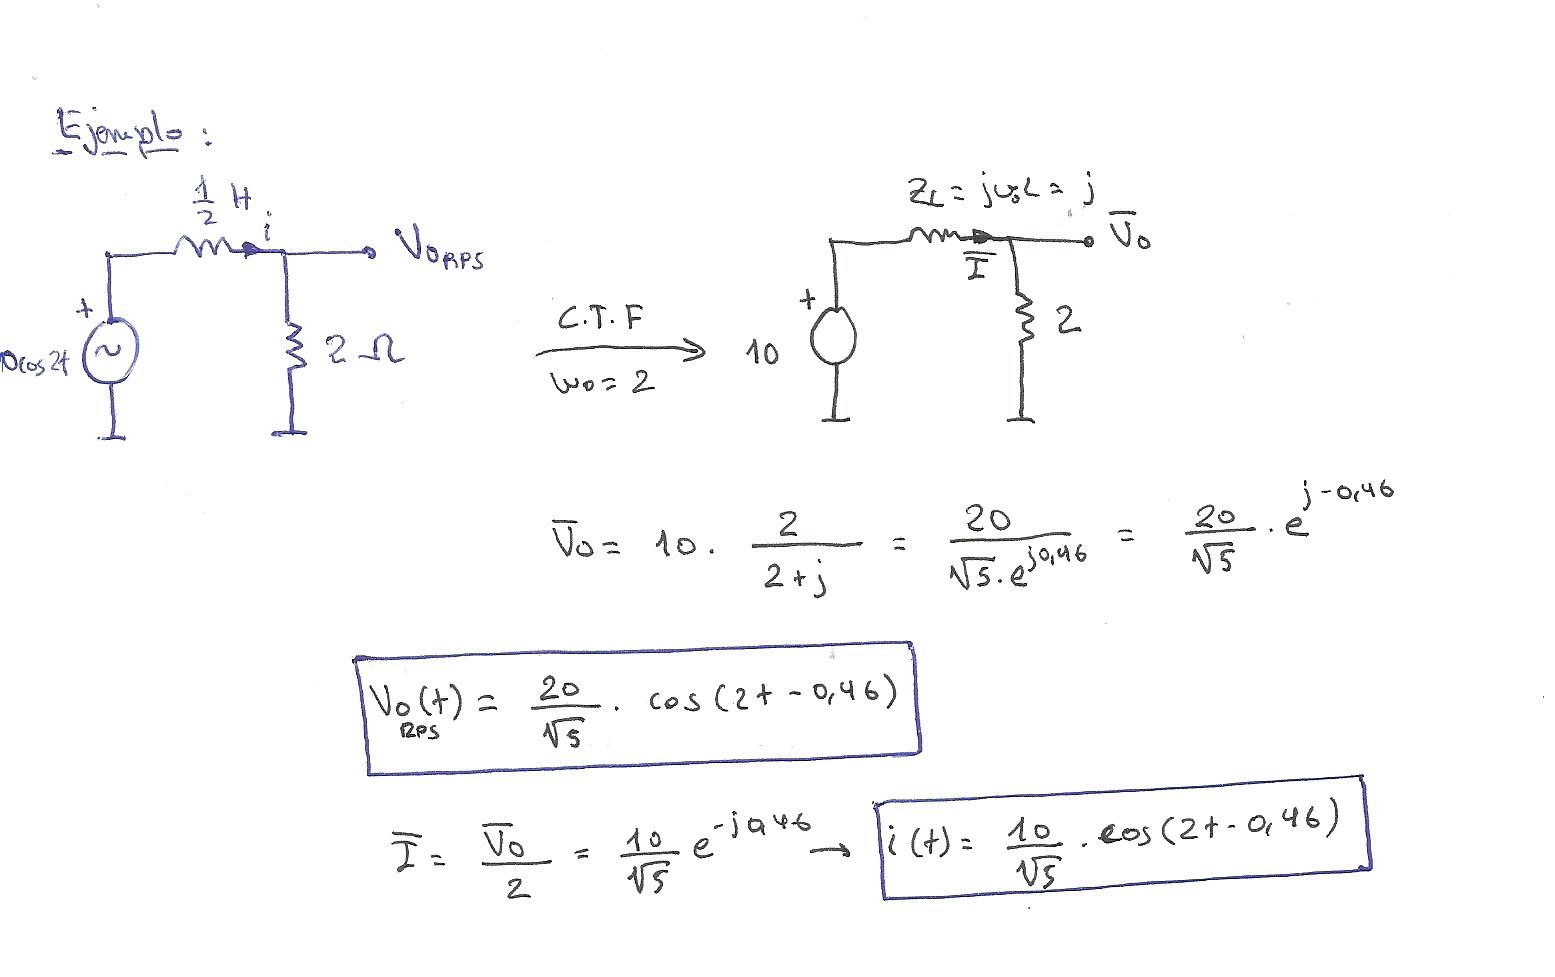 Circuito Lineal : De circuitos lineales marzo